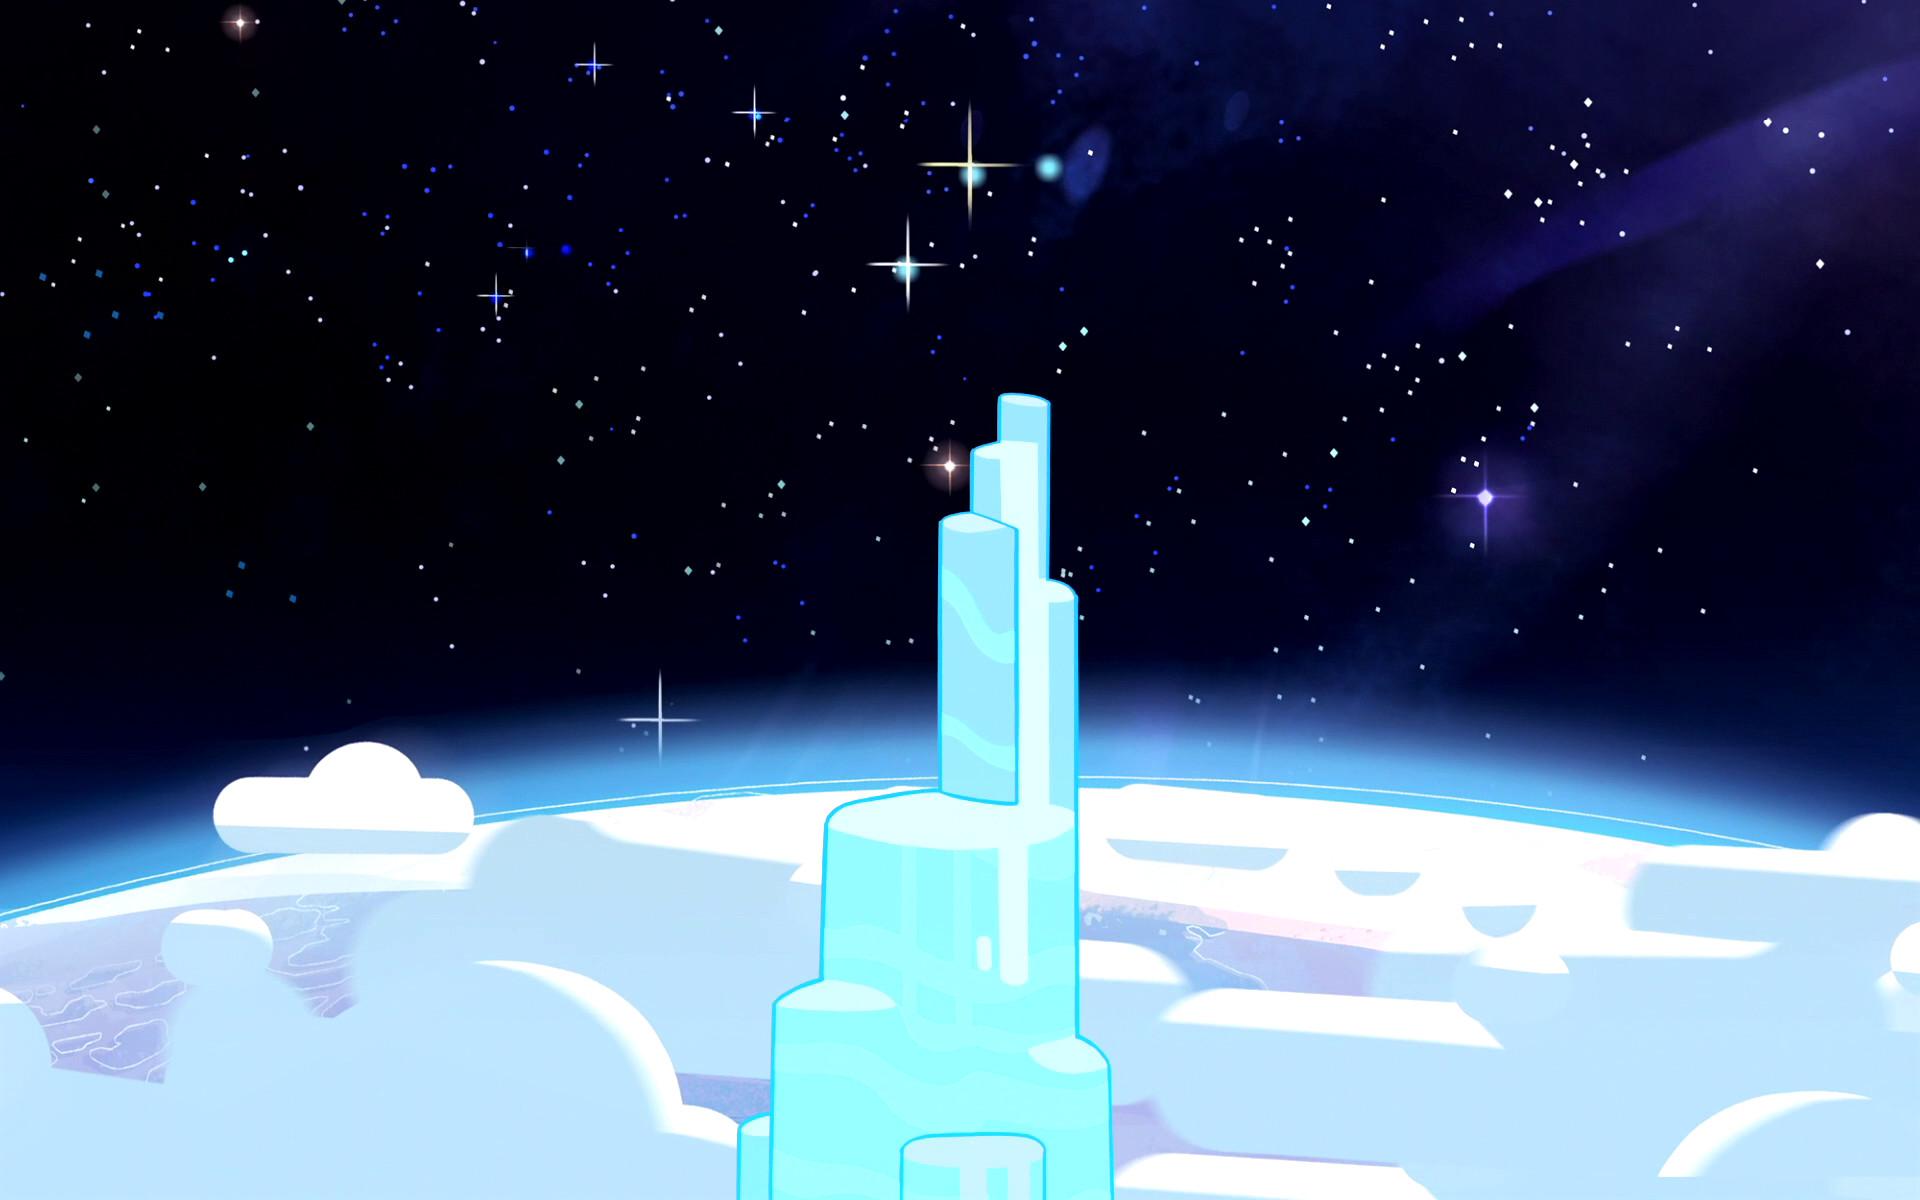 General Steven Universe cartoon